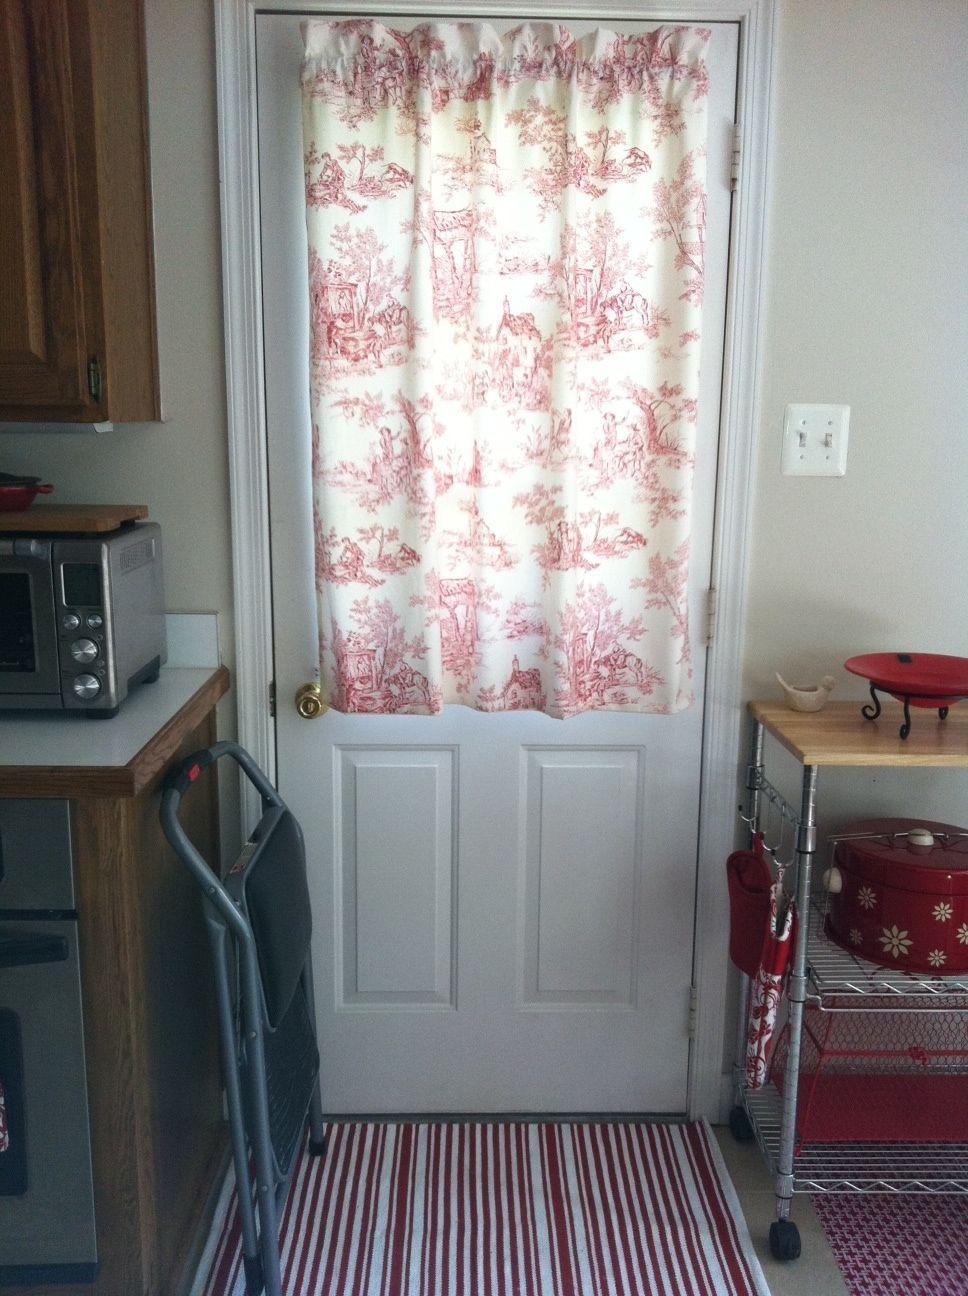 Kitchen door curtain.